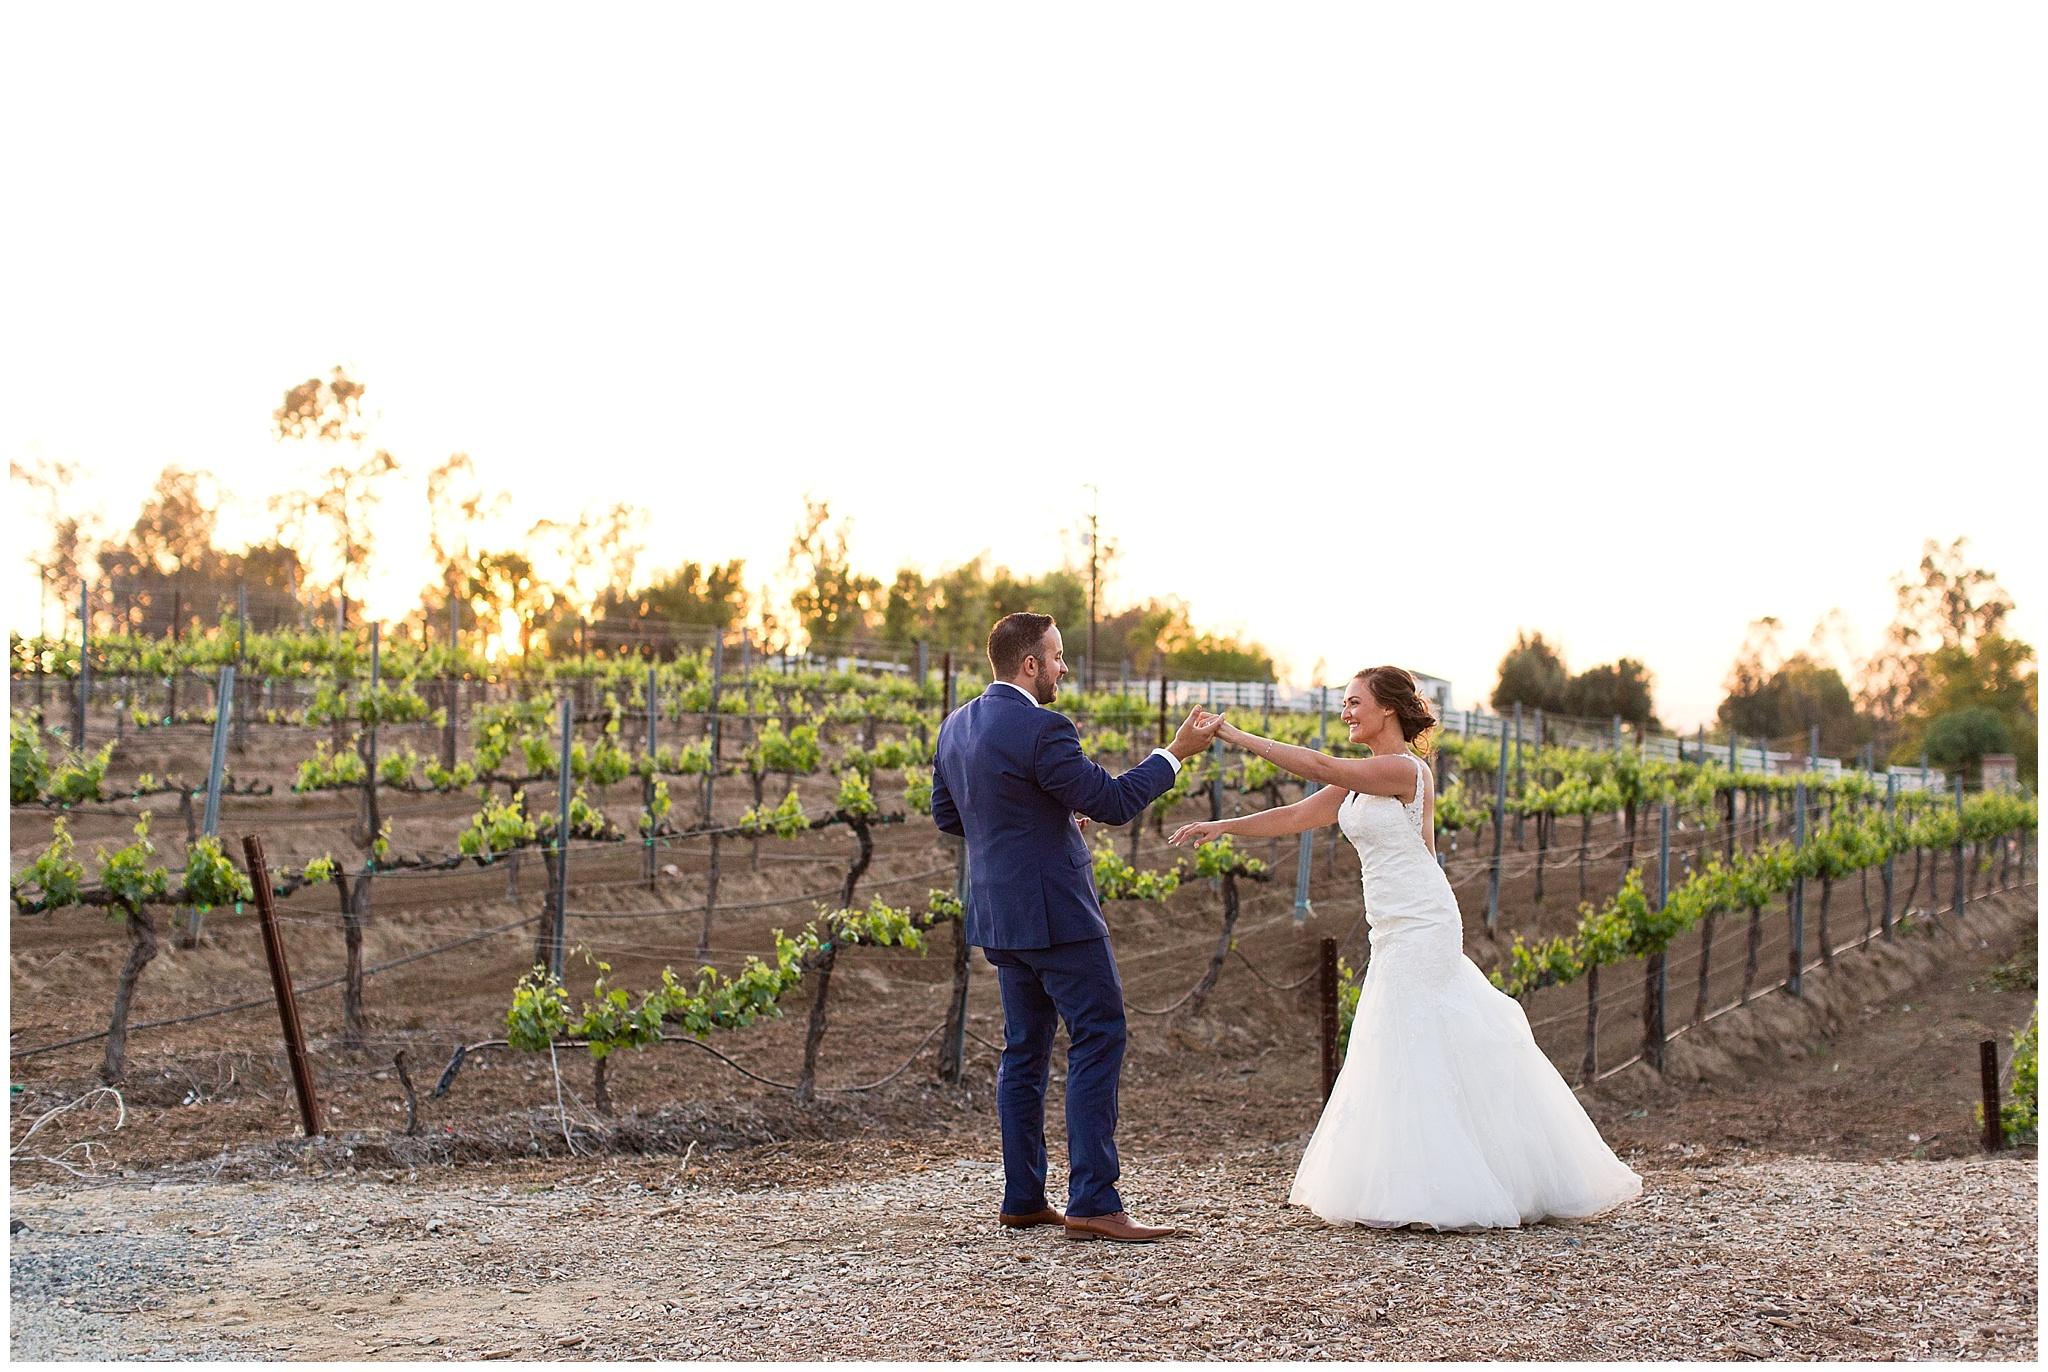 Vinny-Cayt-Wedding-04-26-18-1813.jpg